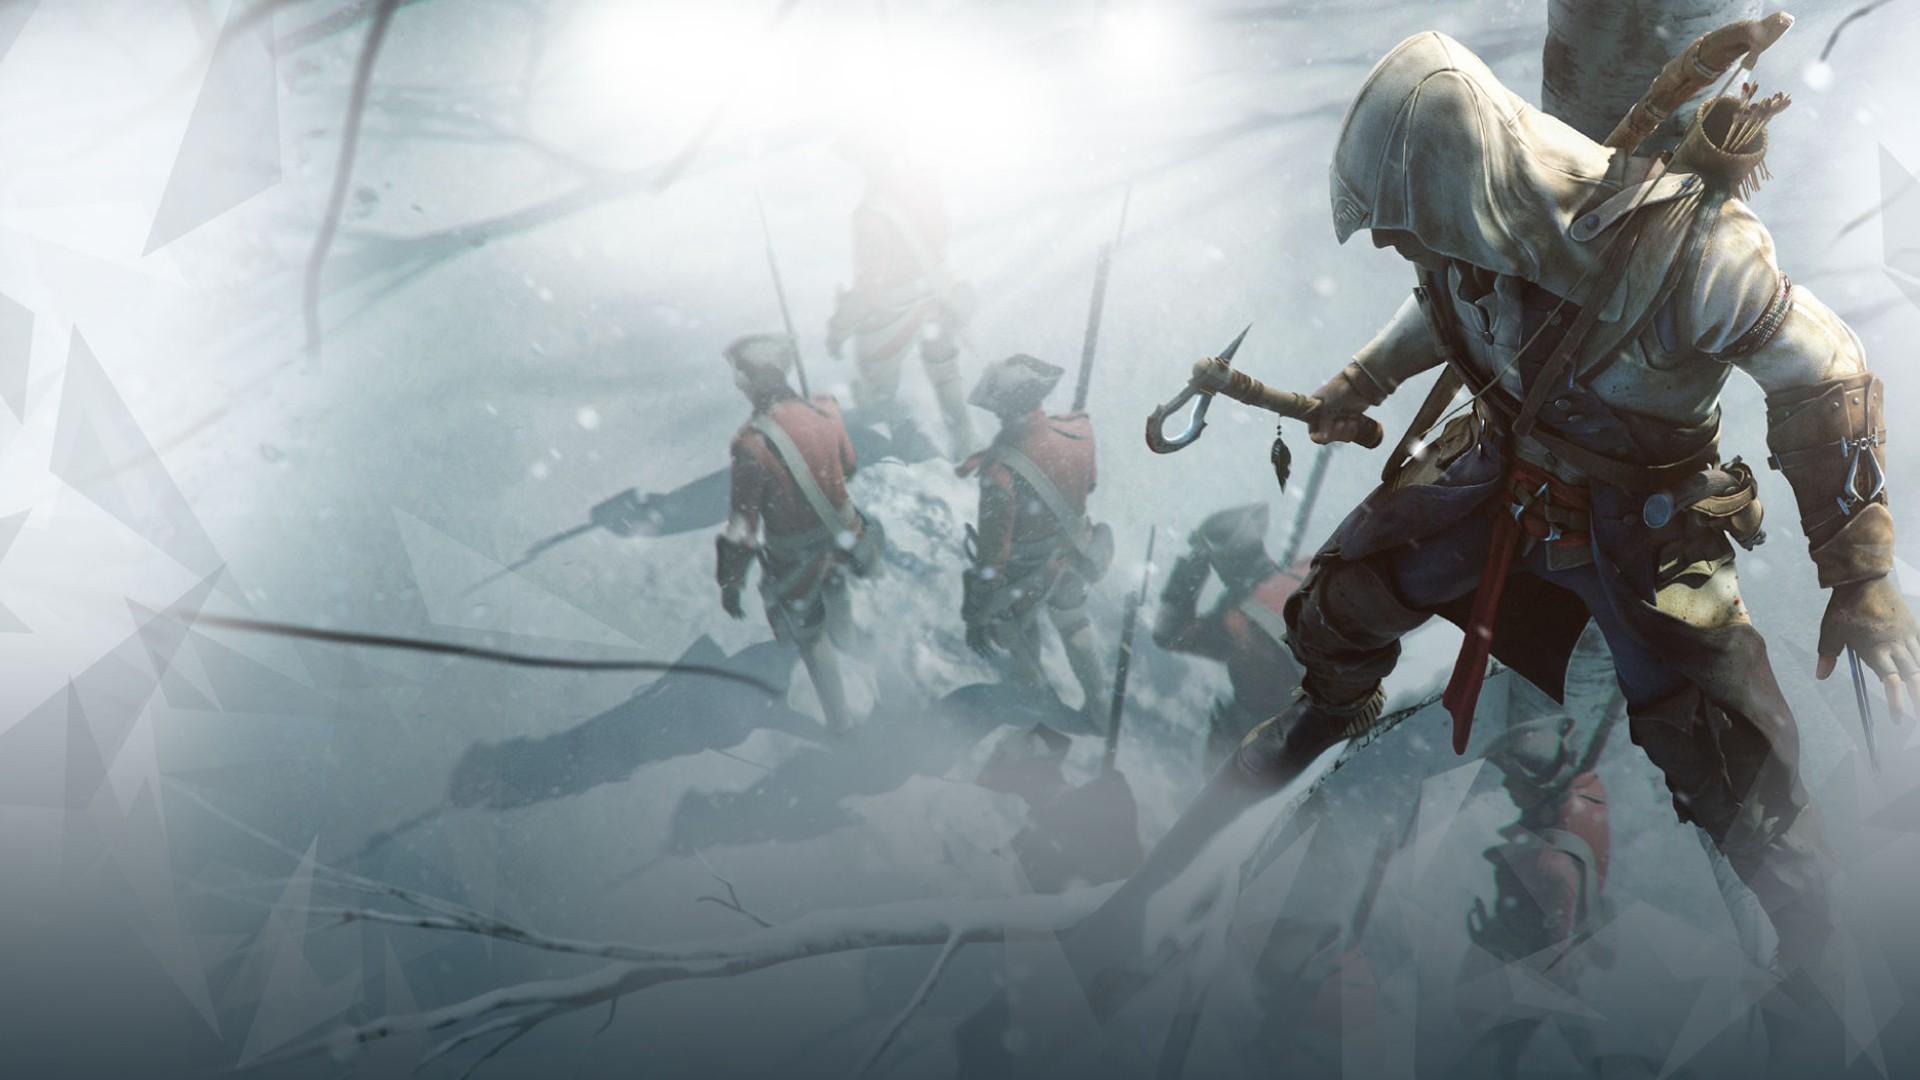 Download Assassins Creed 3 Wallpapers 4 Hd Desktop Wallpapers